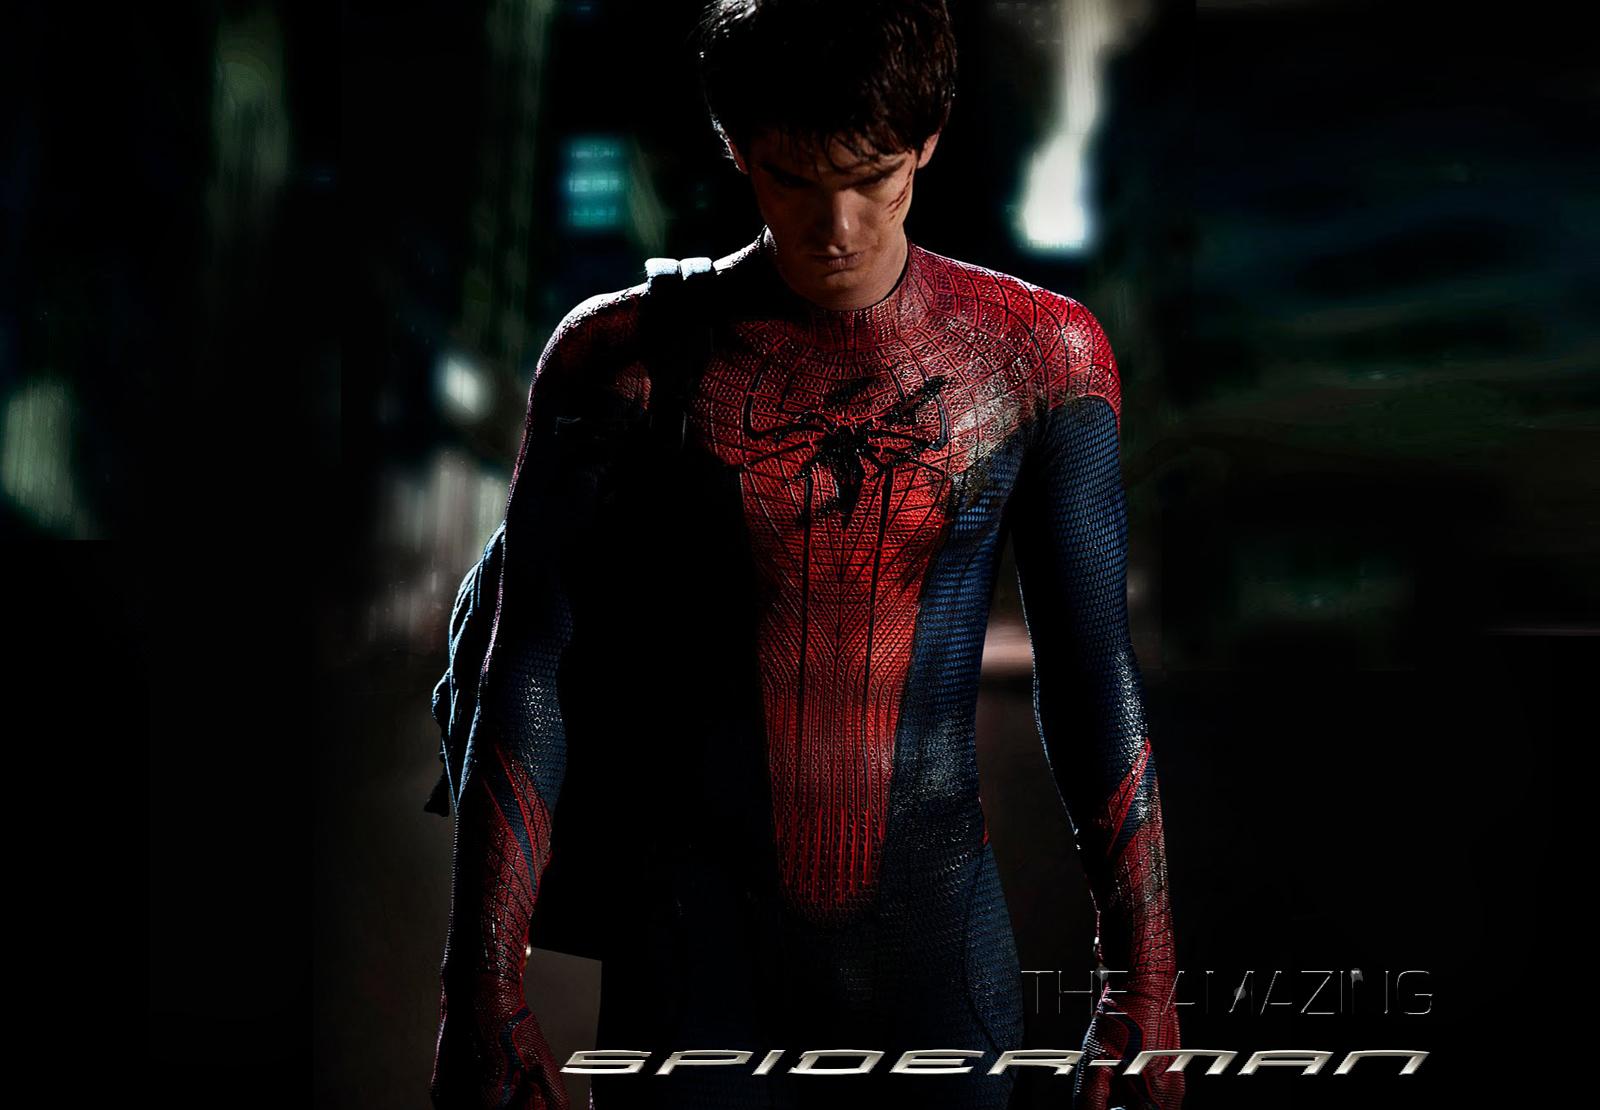 http://3.bp.blogspot.com/-aCuTOa2lN6M/T7PWHSYsLkI/AAAAAAAAAUw/oMXMWkOjbN8/s1600/amazing-spider-man.jpg